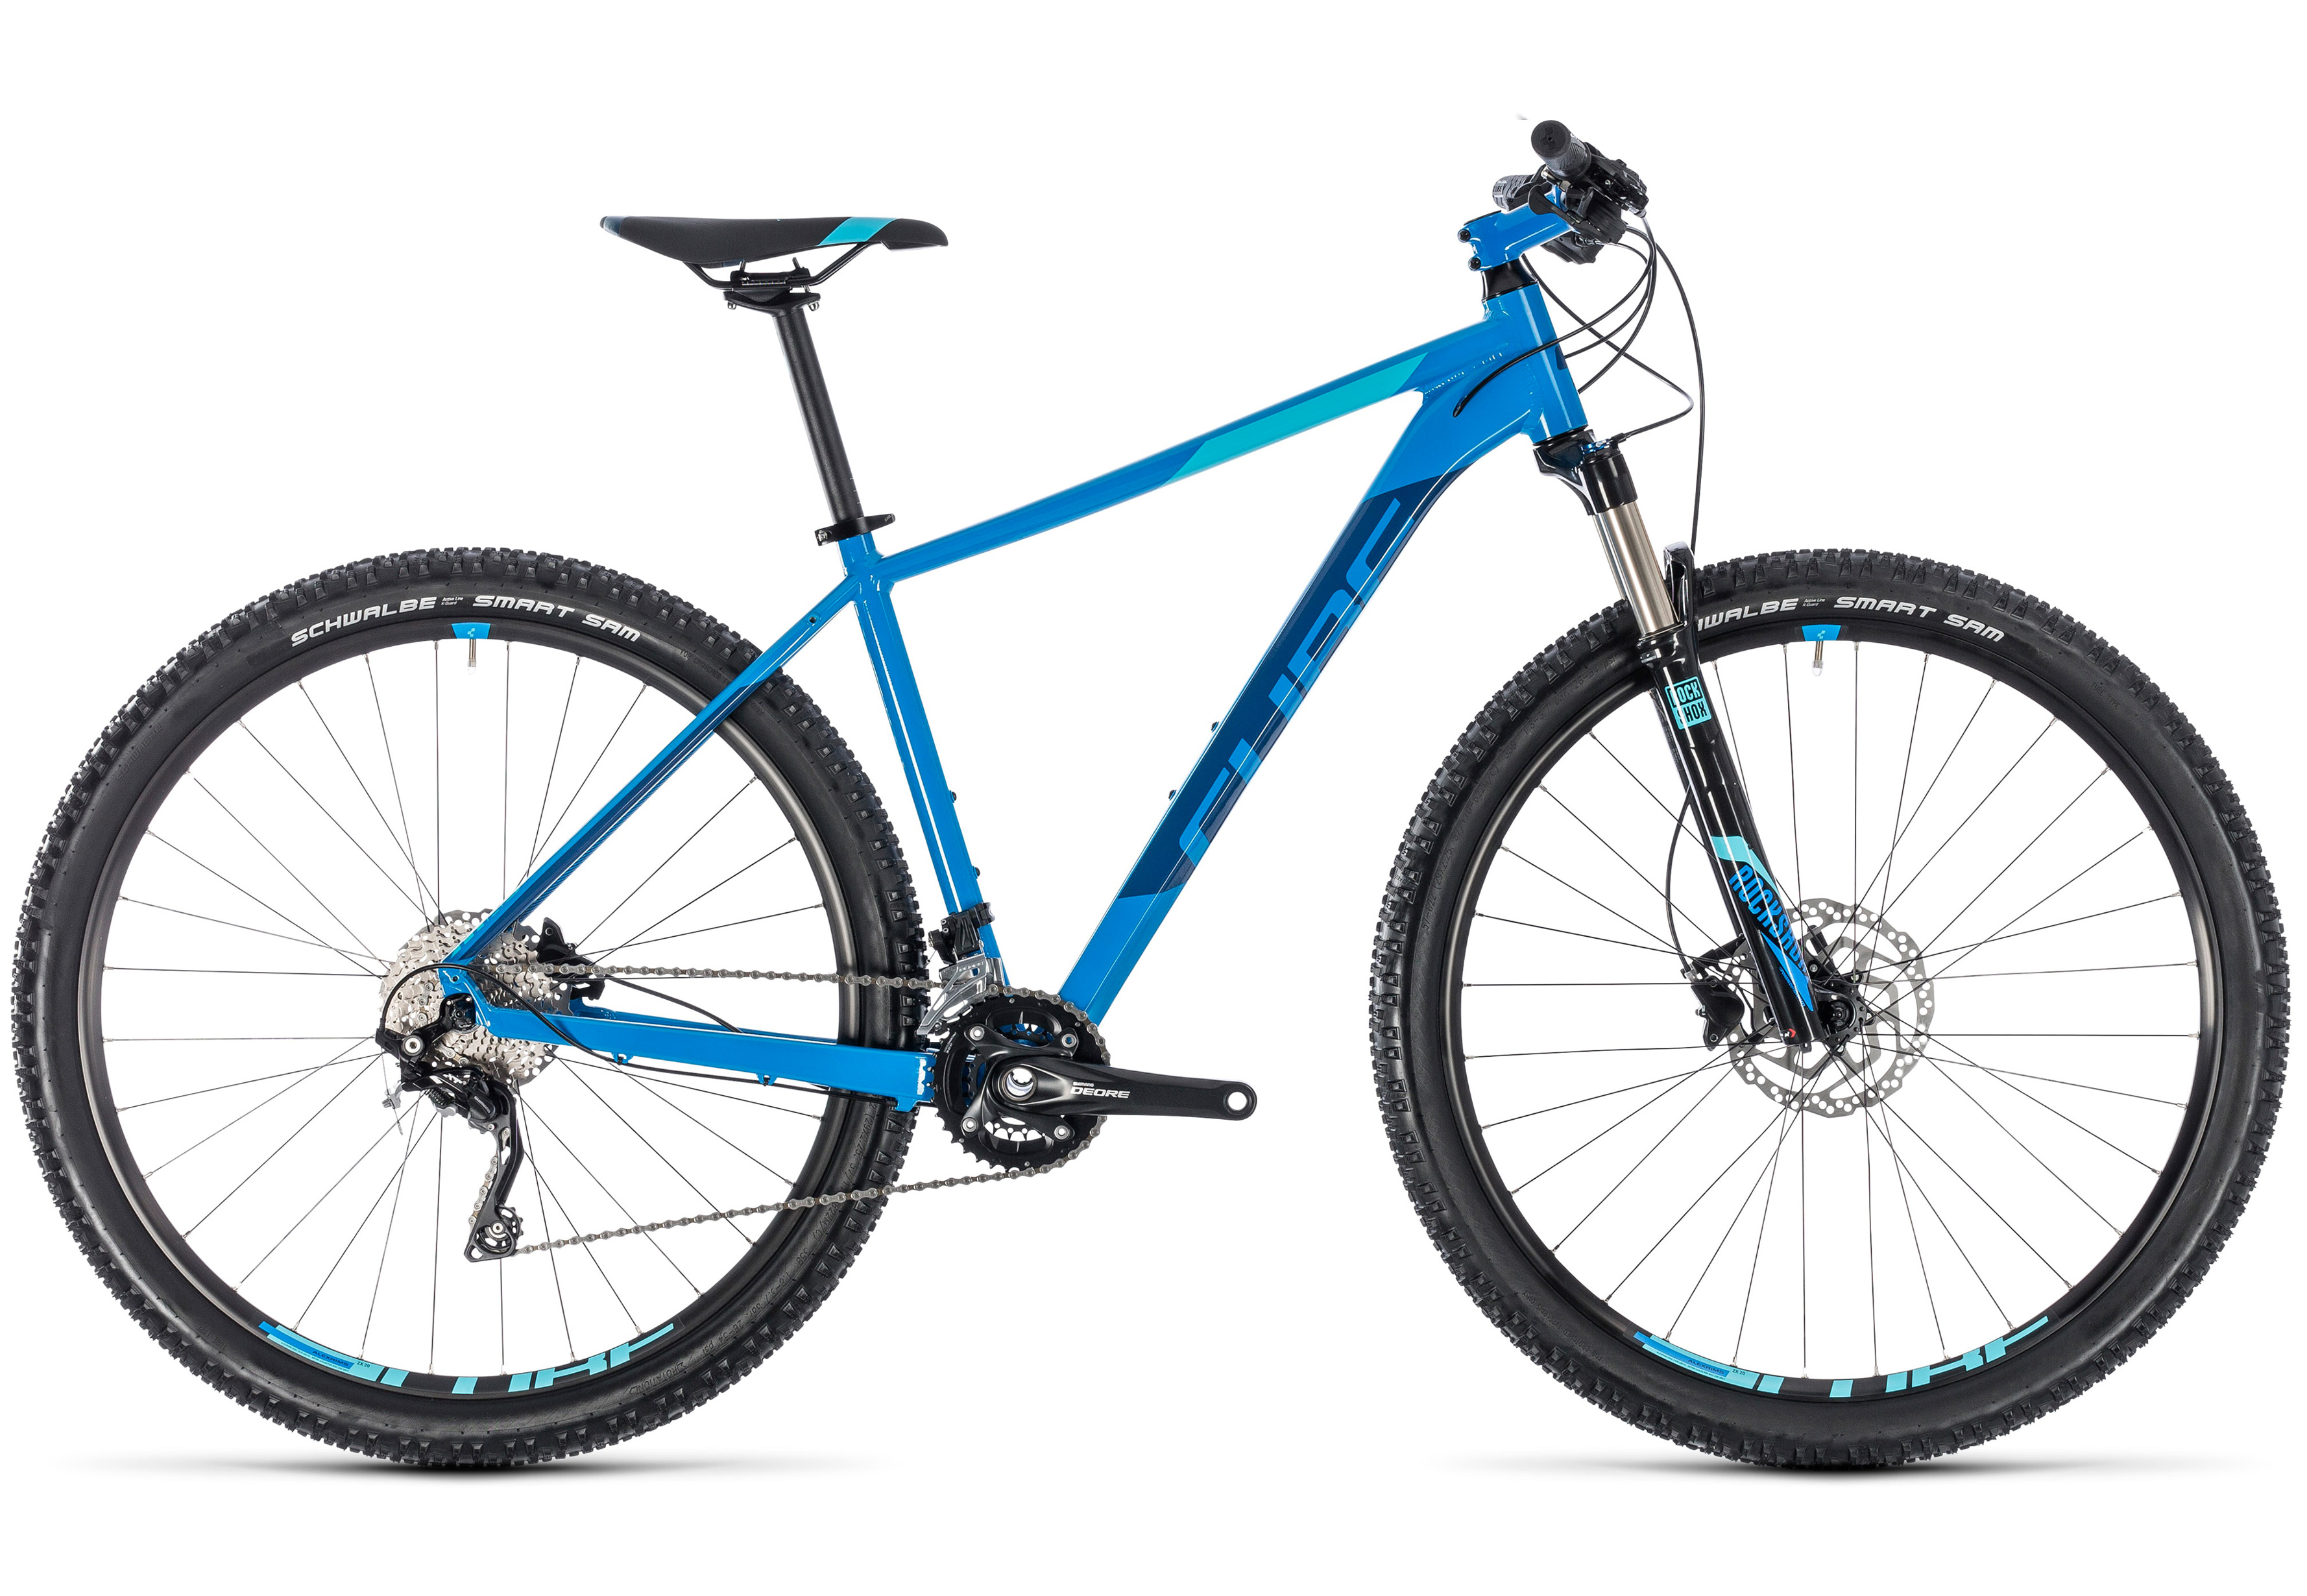 Туристичні велосипеди - Інтернет-магазин Veloman Extreme 7372fef932e99